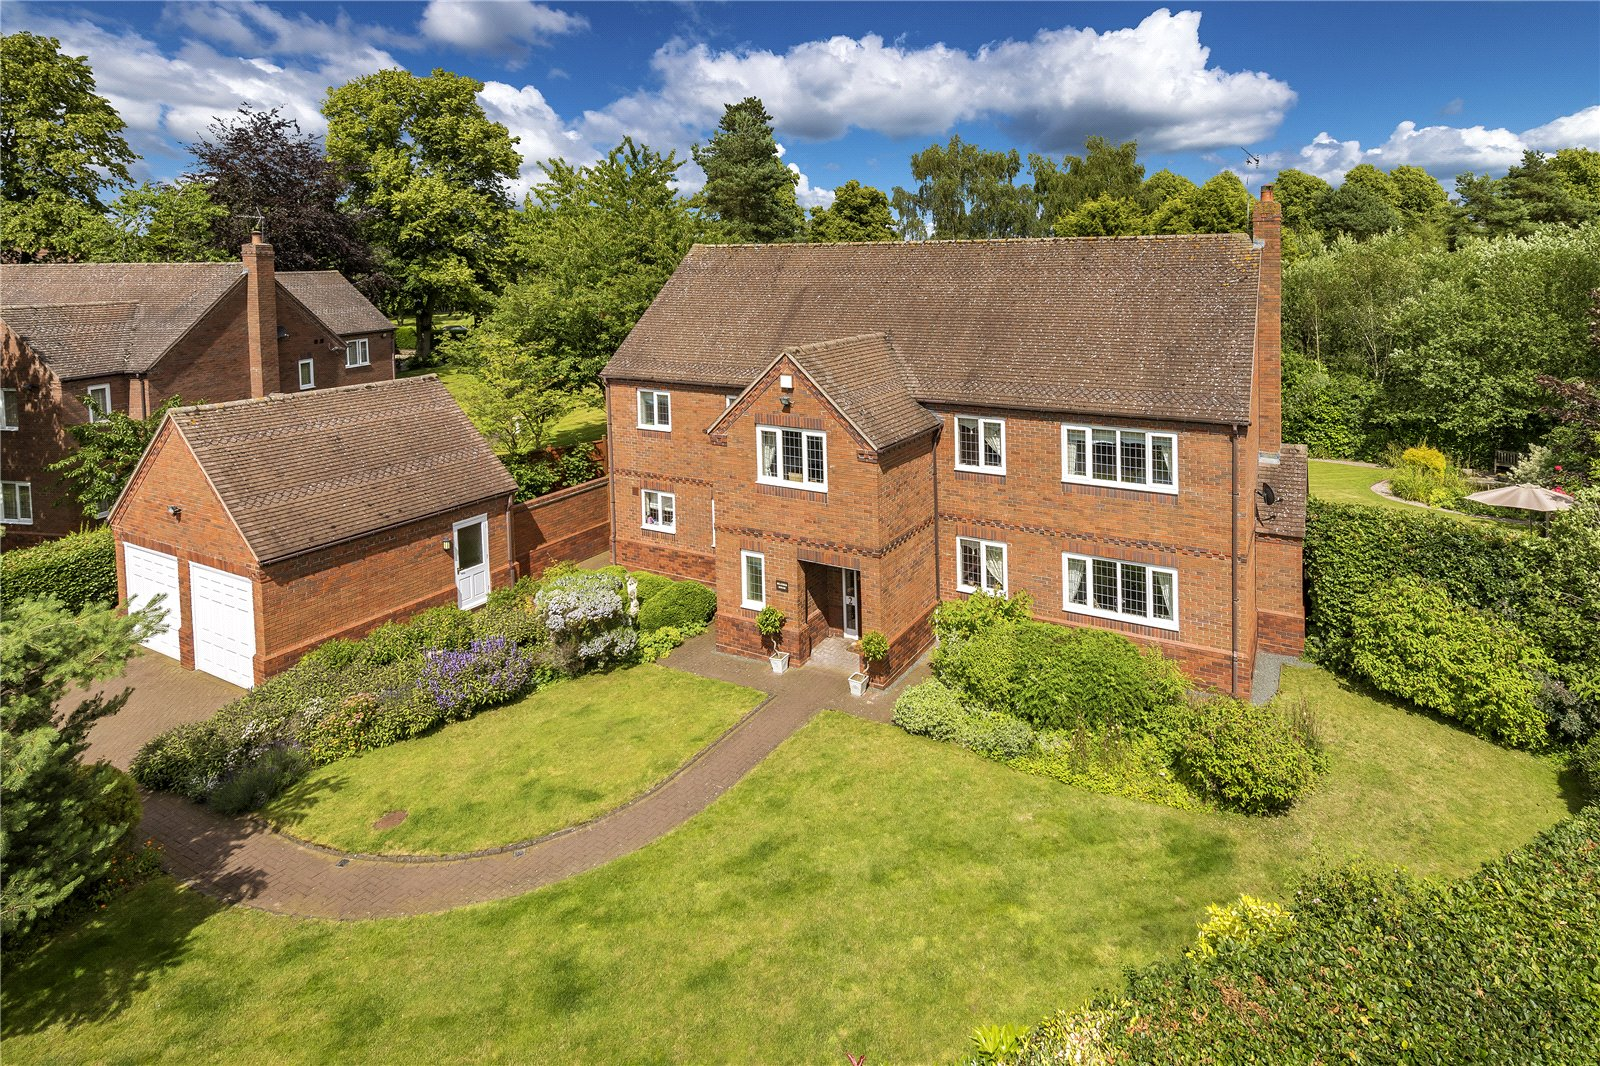 Heather House, 2 Ryton Park, Ryton, Shifnal, Shropshire, TF11